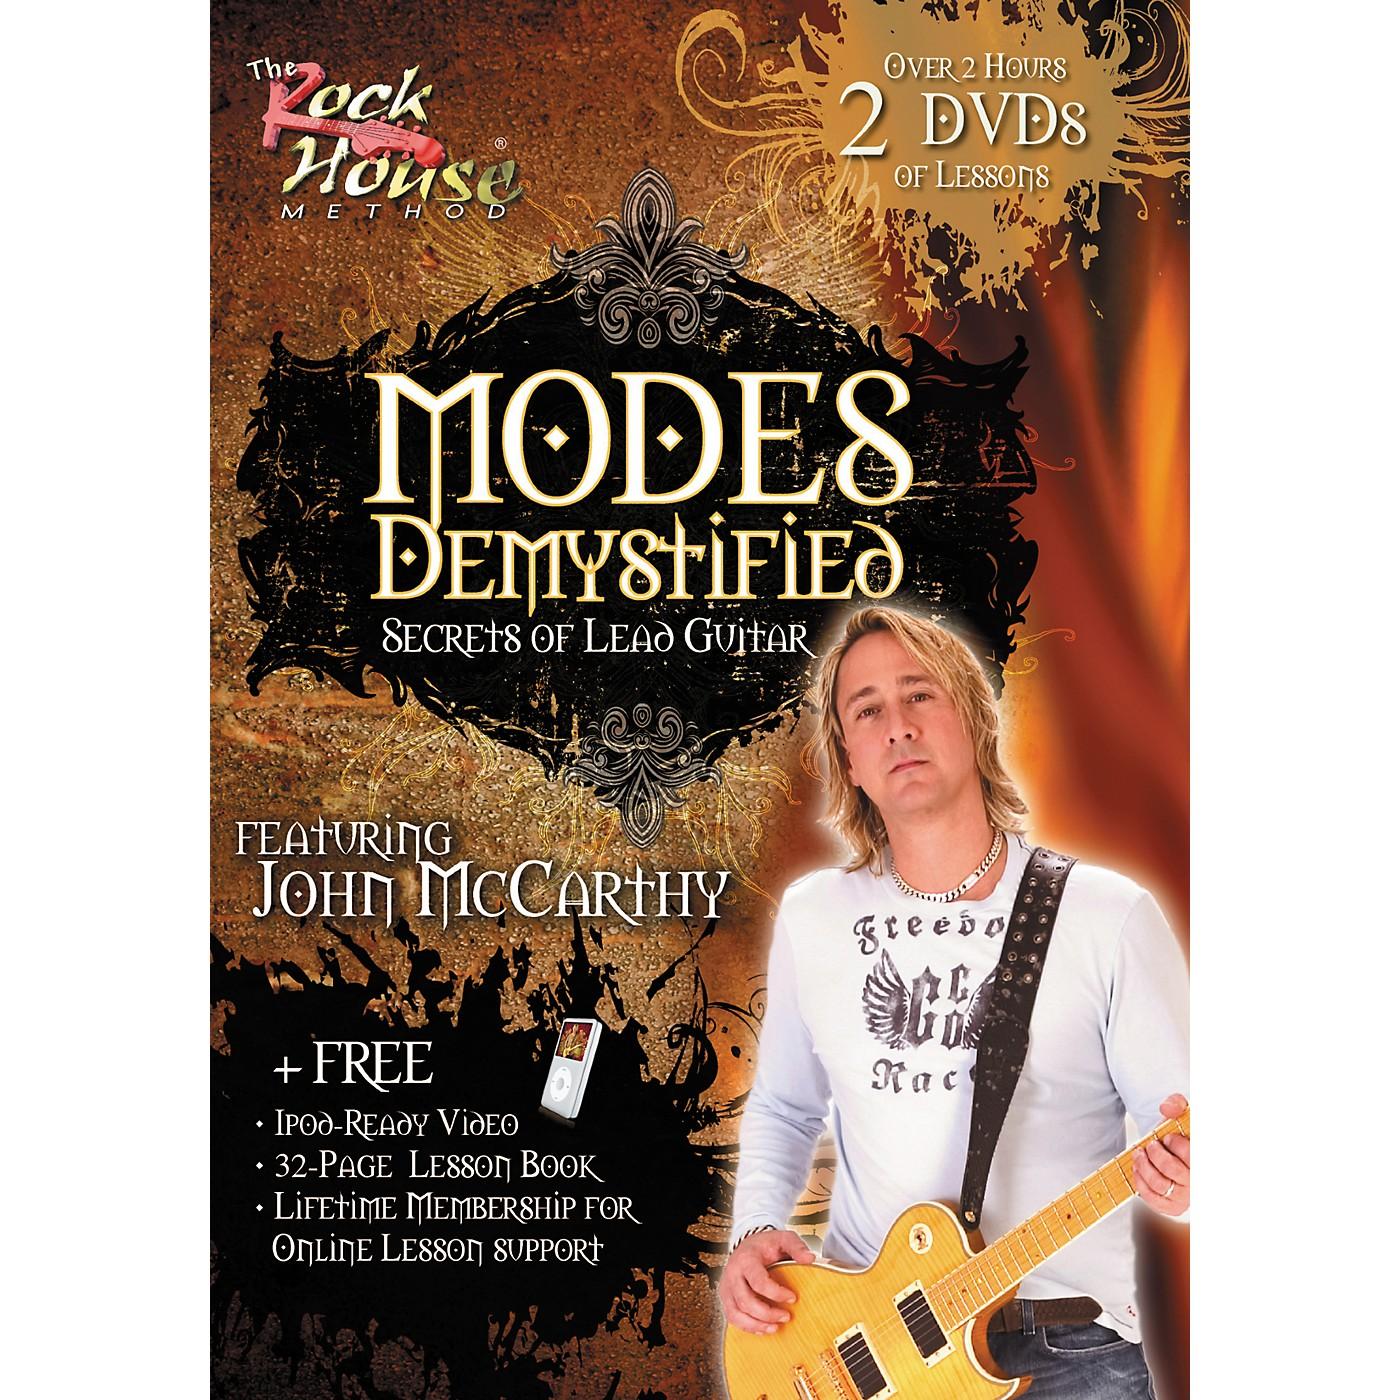 Rock House Modes Demystified - Secrets of Lead Guitar Featuring John McCarthy (2-DVD Set) thumbnail